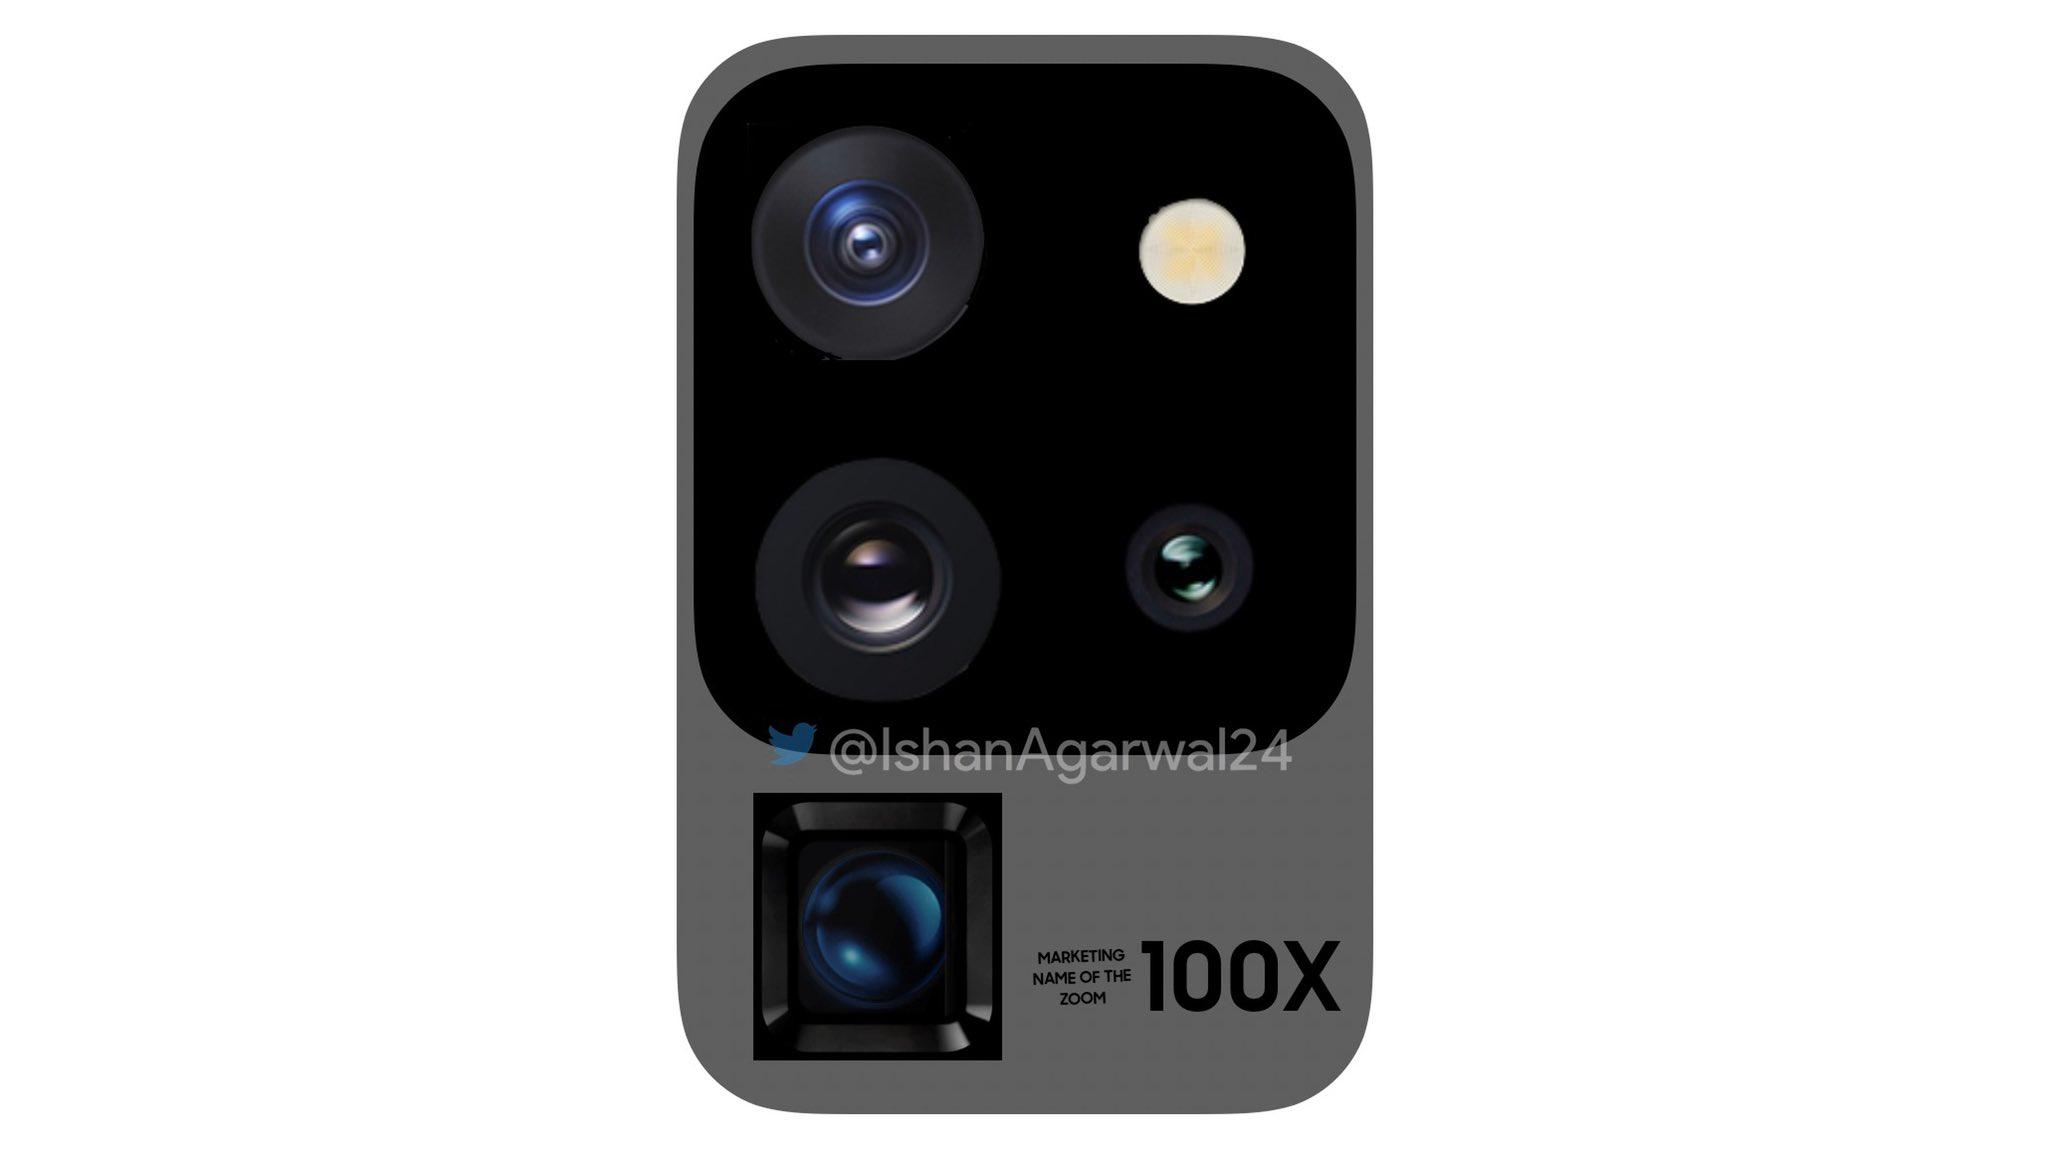 知名爆料人Ishan Agarwal近日在推特上透露,三星Galaxy S20 Ultra 5G的摄像镜头将可支持100倍变焦拍摄。-图取自Ishan Agarwal的推特-